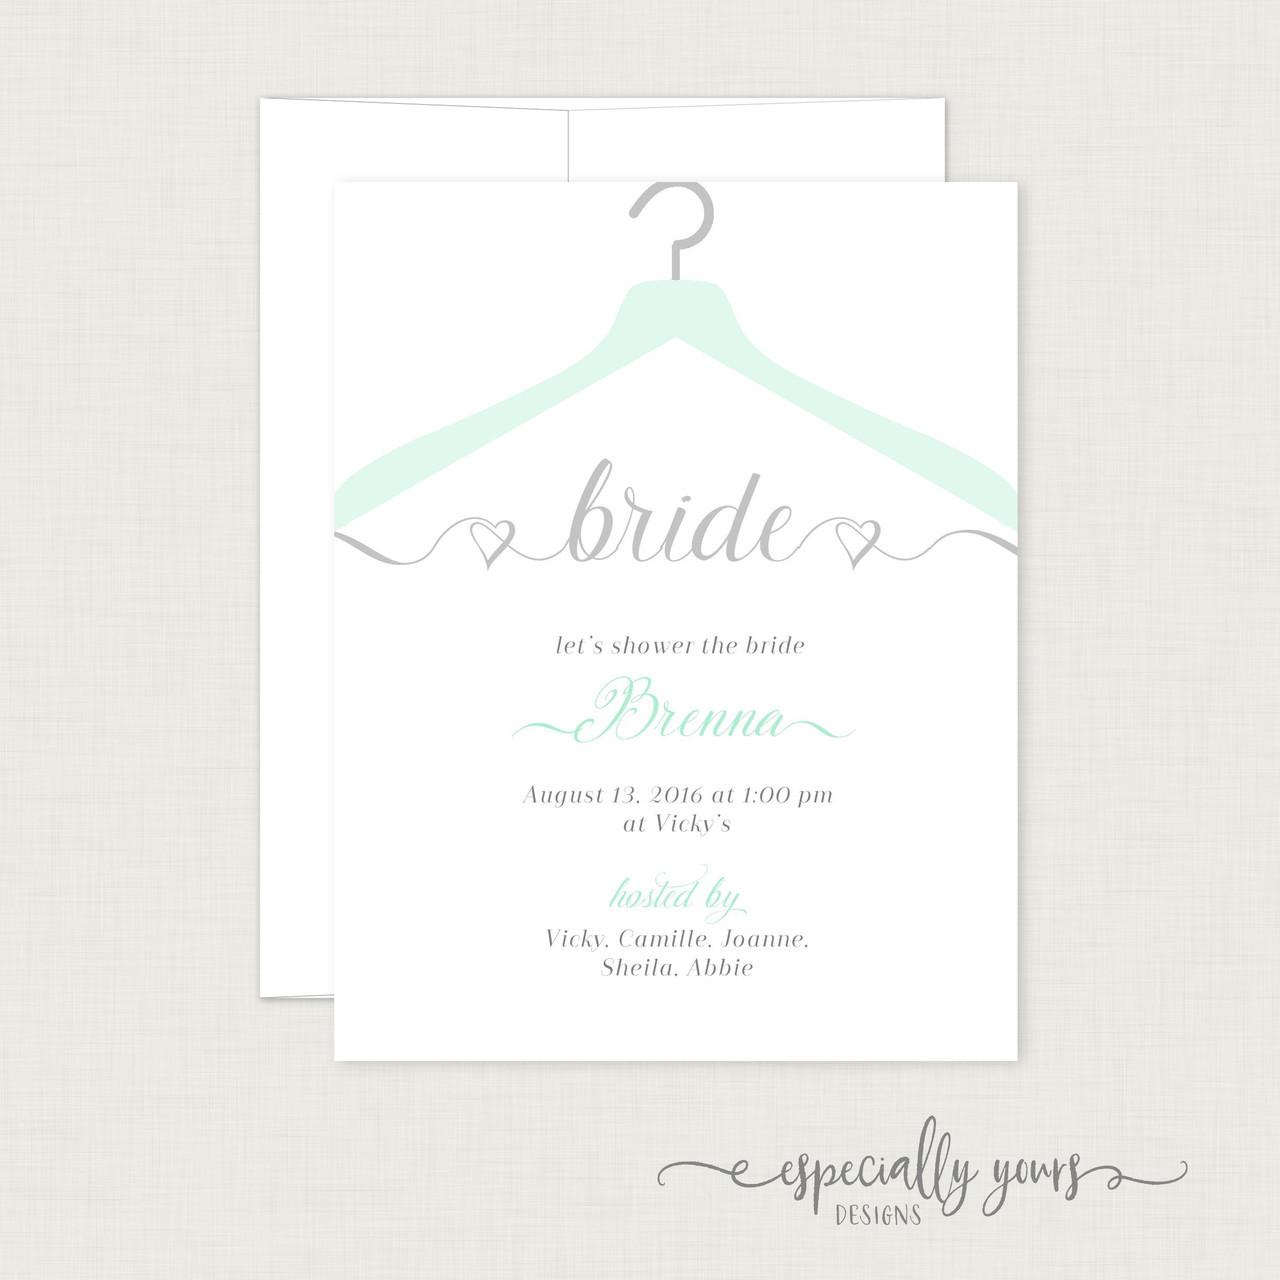 Bridal Hanger Bridal Shower Invitation - Especially Yours Designs